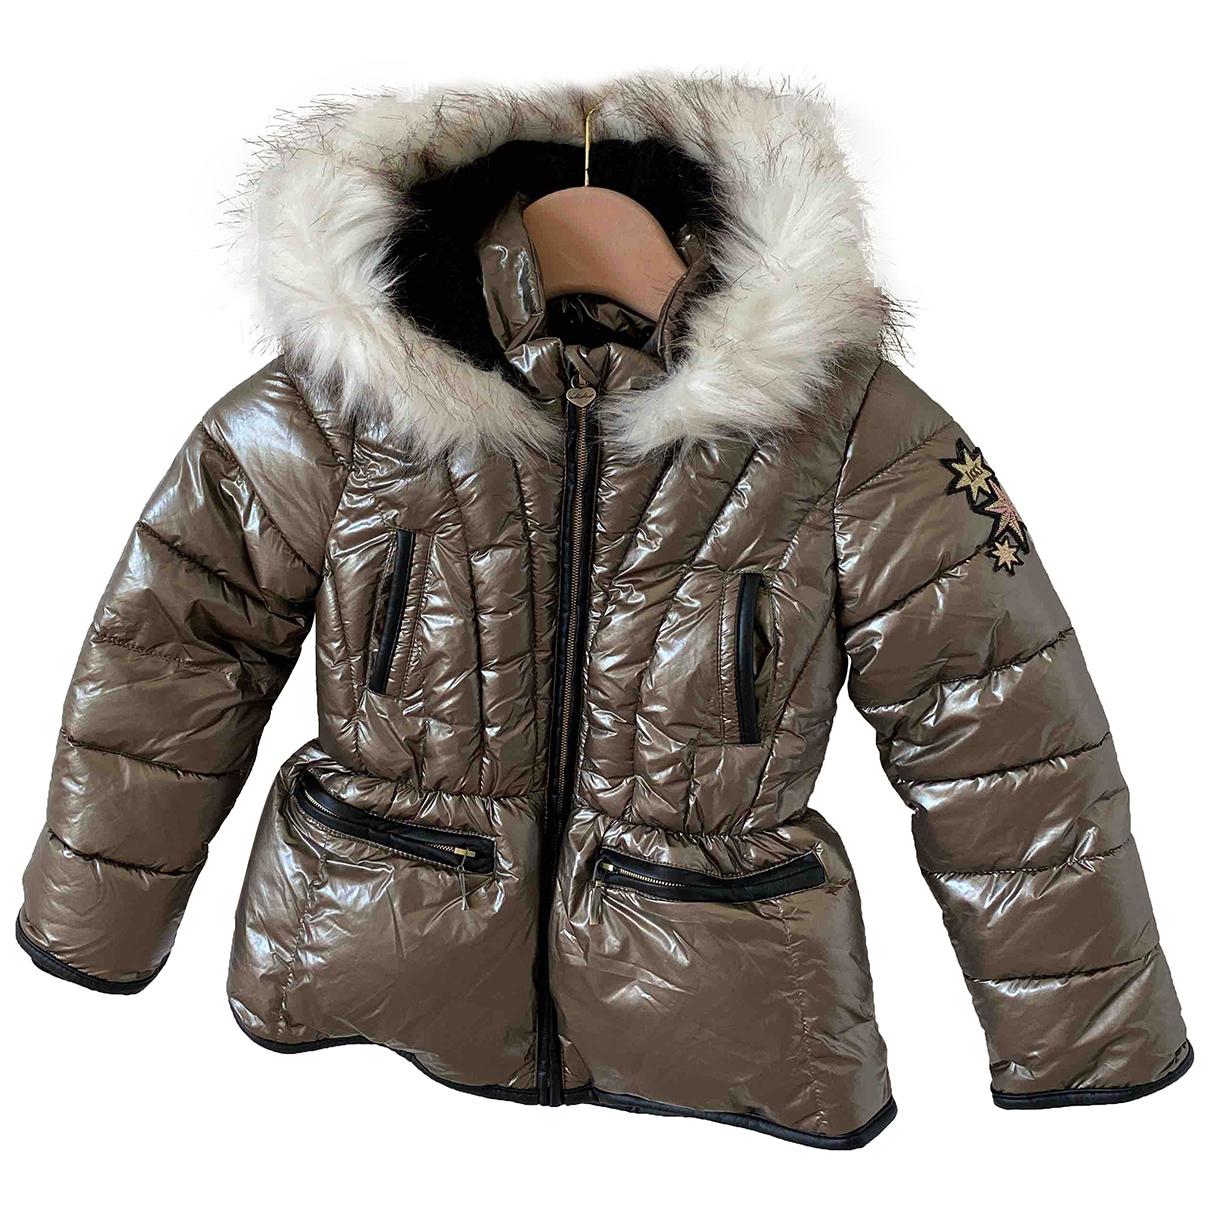 Ikks N Metallic jacket & coat for Kids 6 years - up to 114cm FR